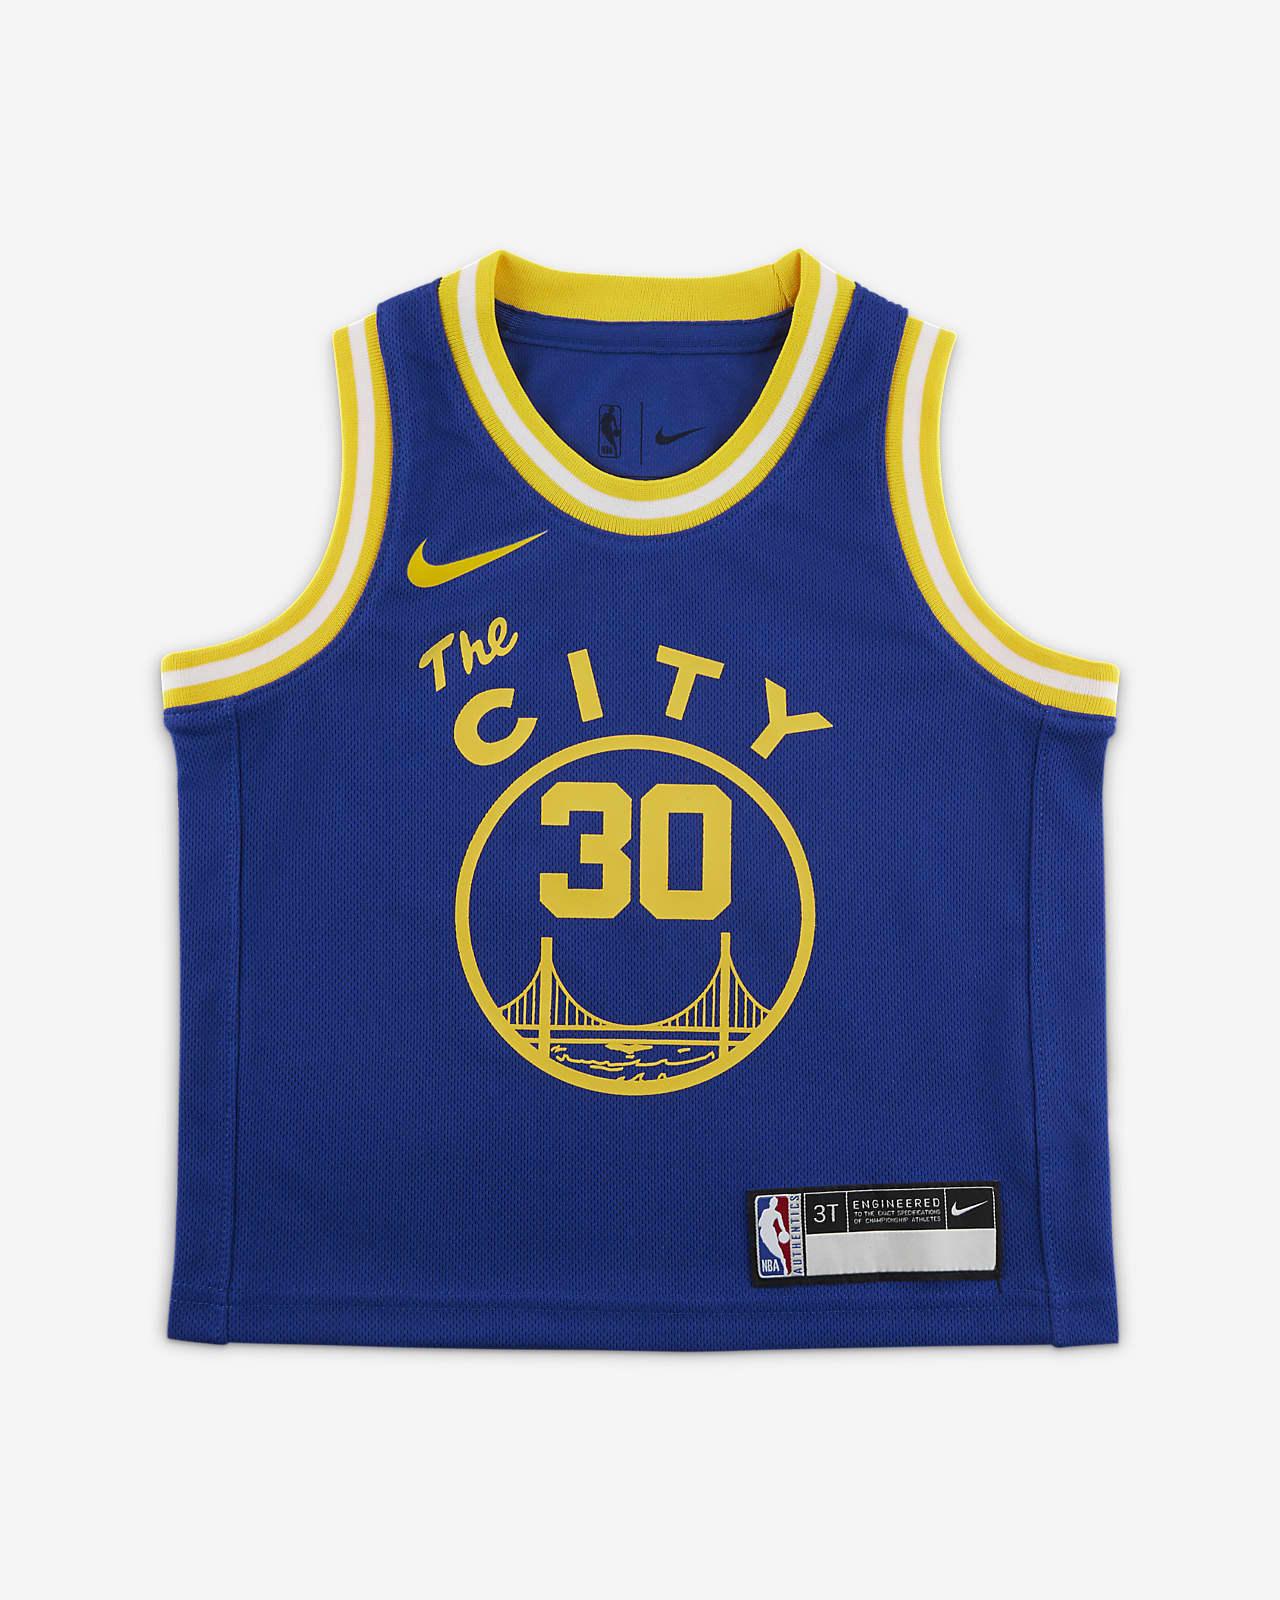 金州勇士队 (Stephen Curry) Classic Edition Nike NBA Swingman Jersey 婴童球衣